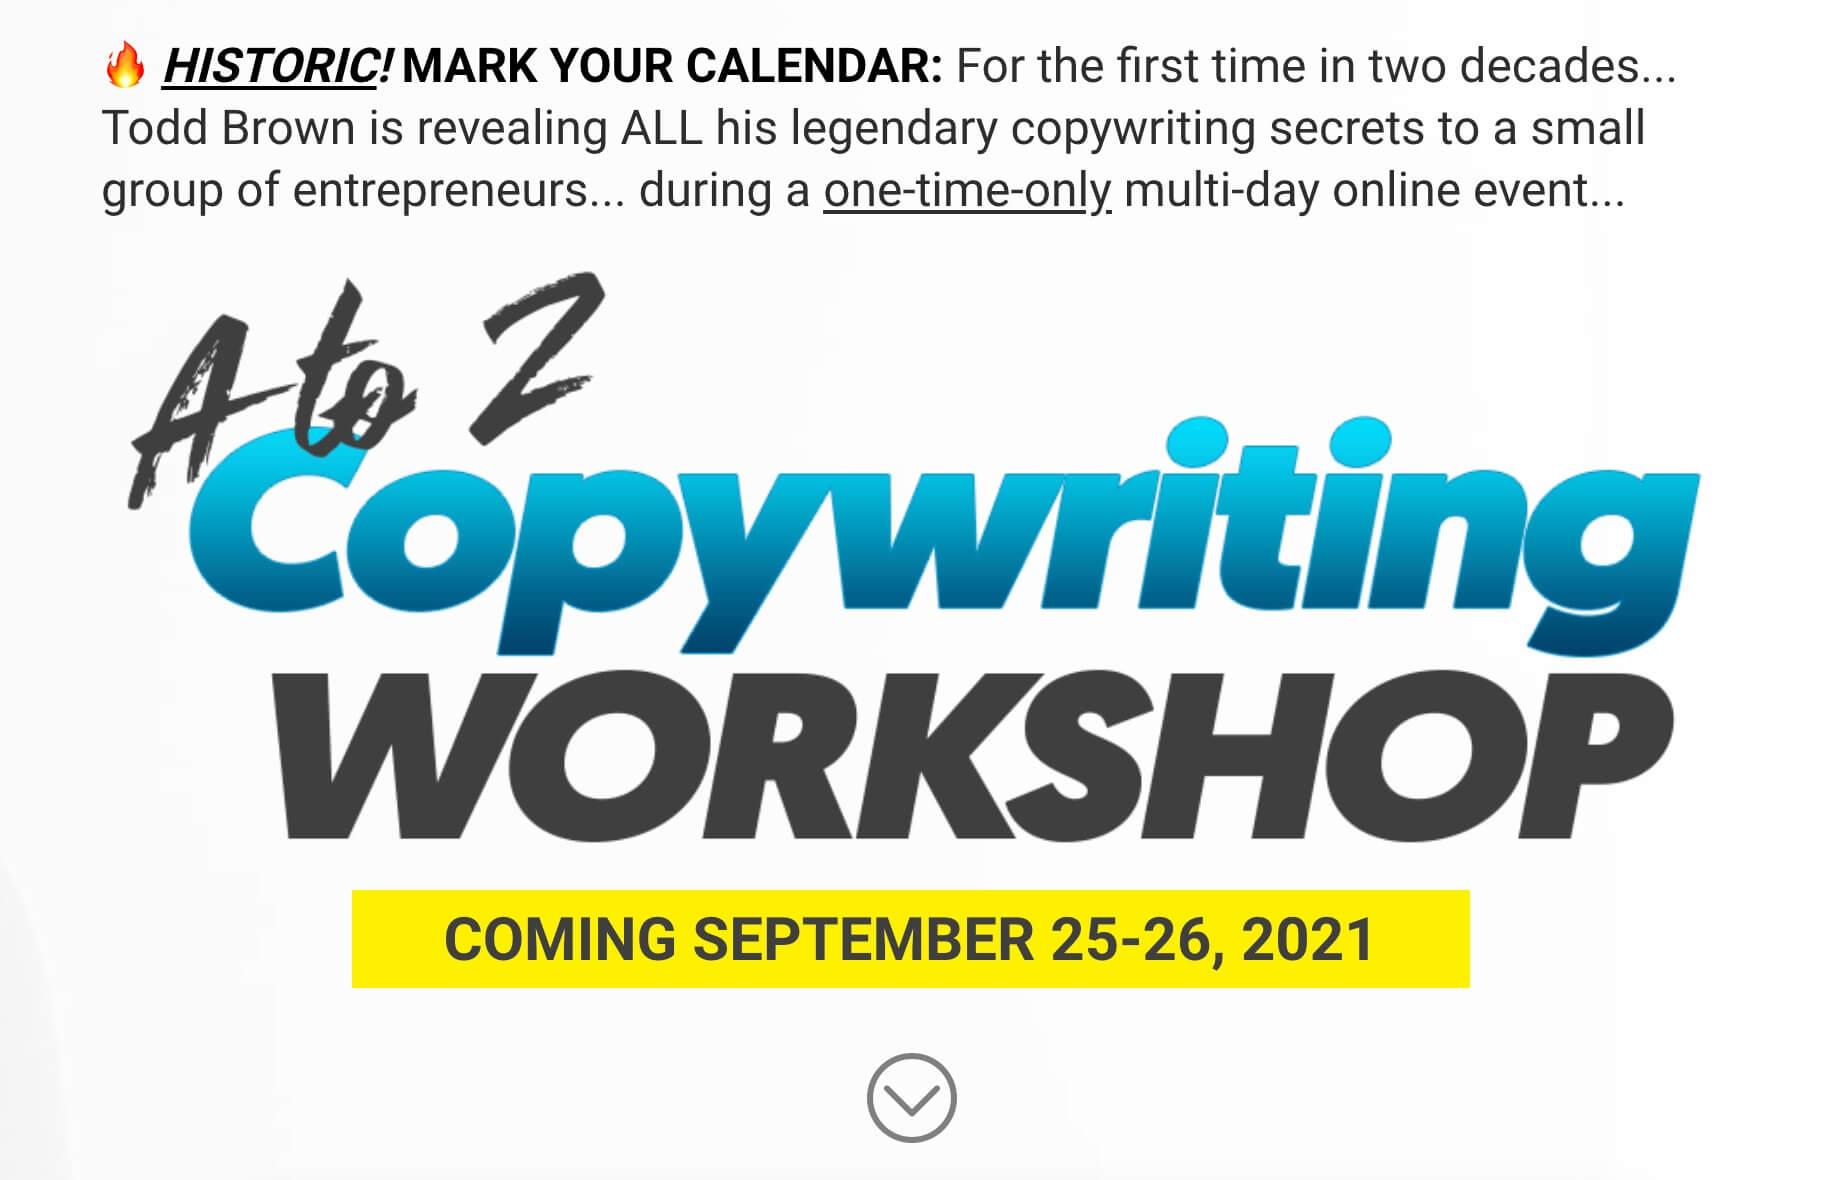 Todd Brown A-Z Copywriting Workshop